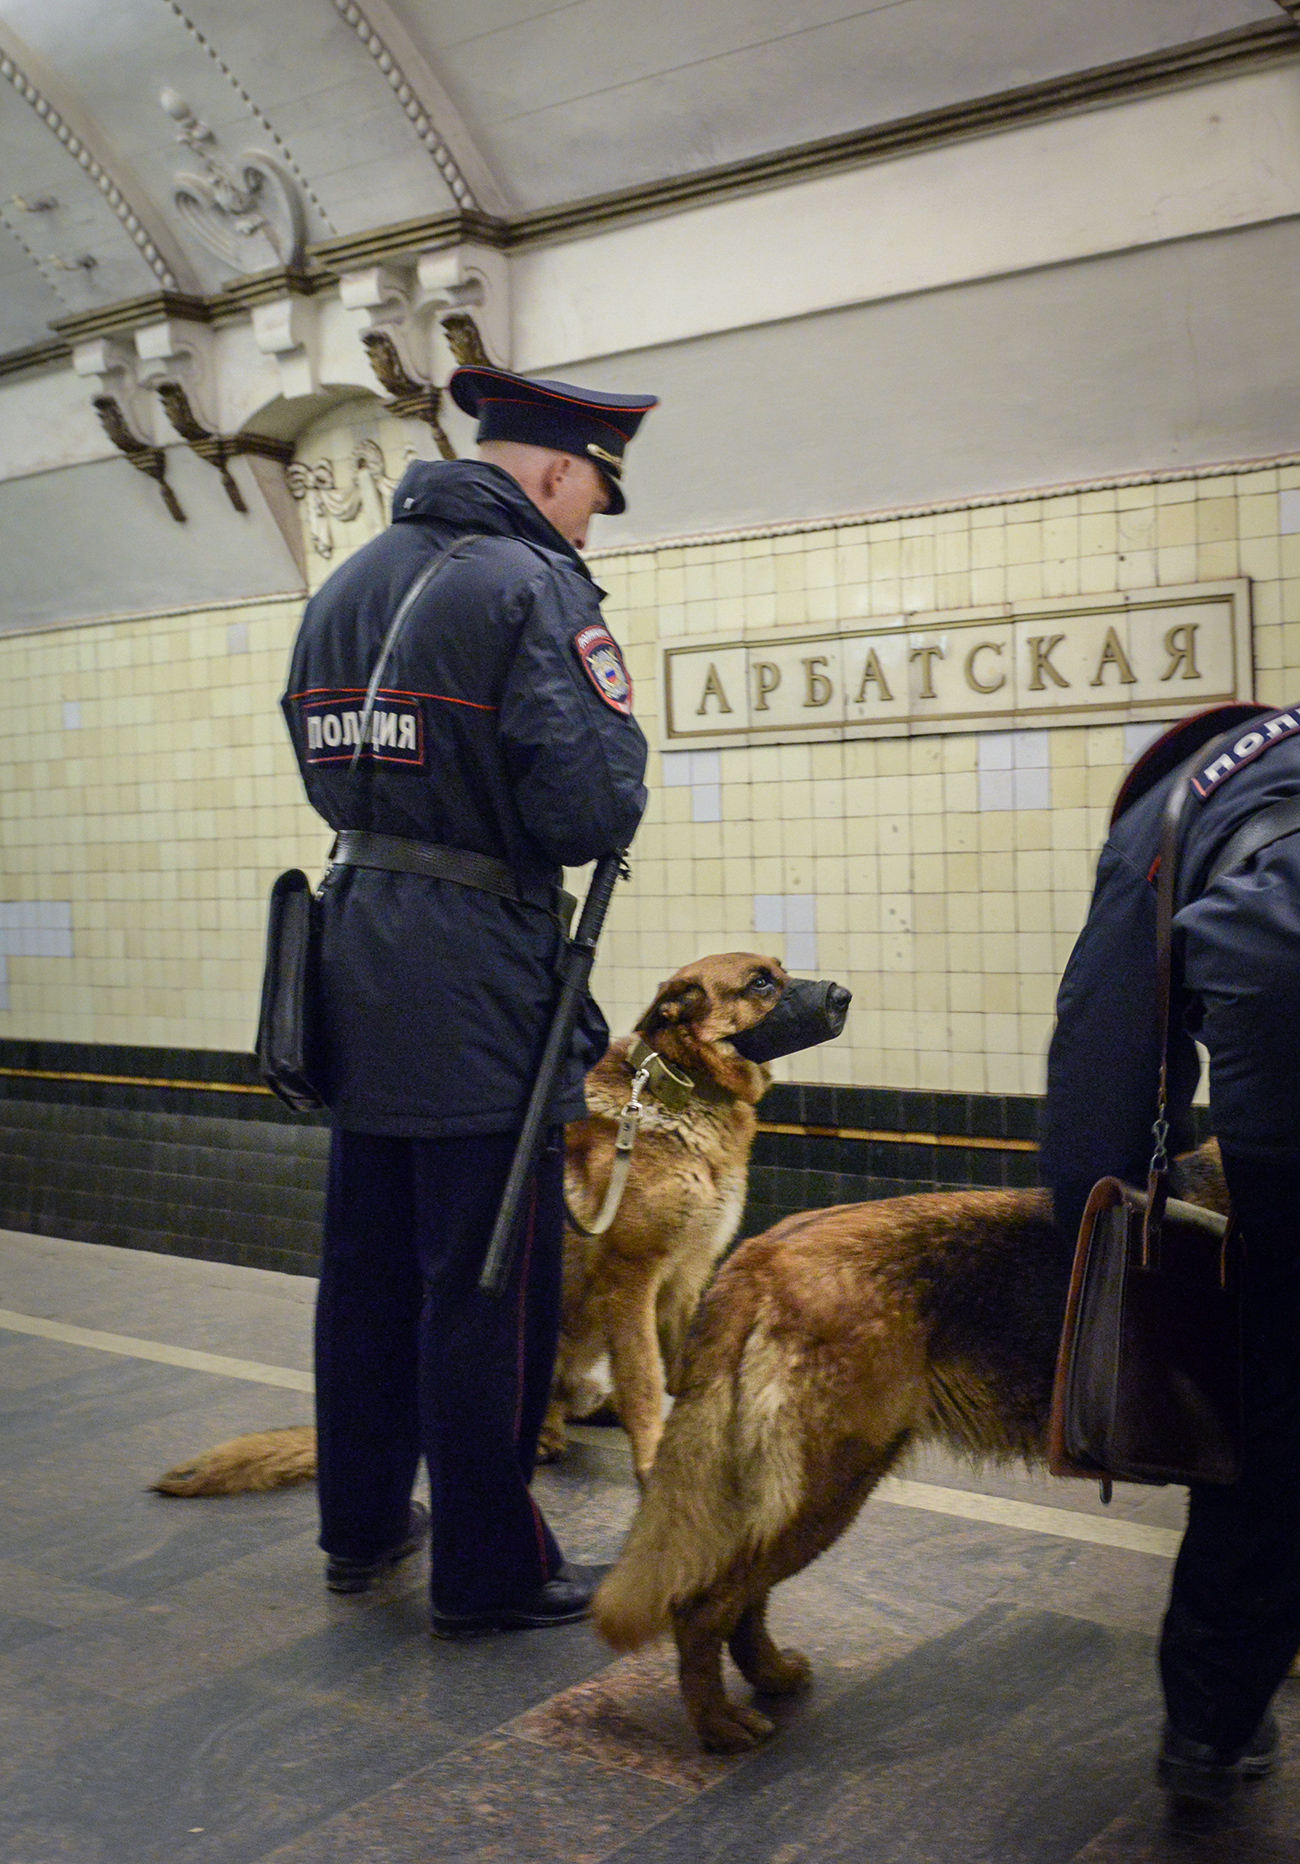 MOSCOW, RUSSIA. APRIL 27, 2015. Police officers with dogs at Arbatskaya Station (Arbatsko-Pokrovskaya Line) of the Moscow Metro.  / Nikolai Galkin/TASS